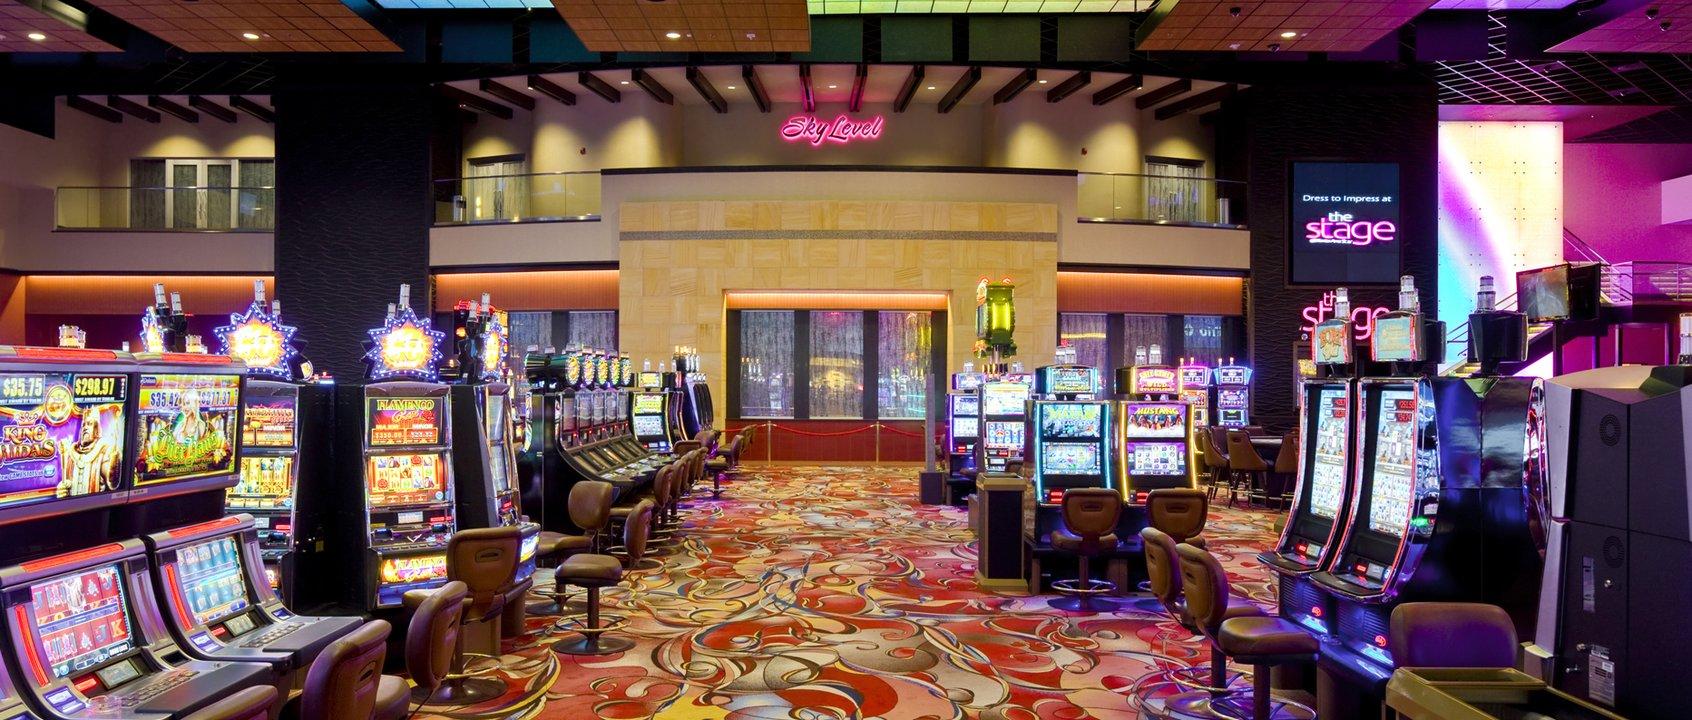 2006 unlawful internet gambling enforcement act uigea